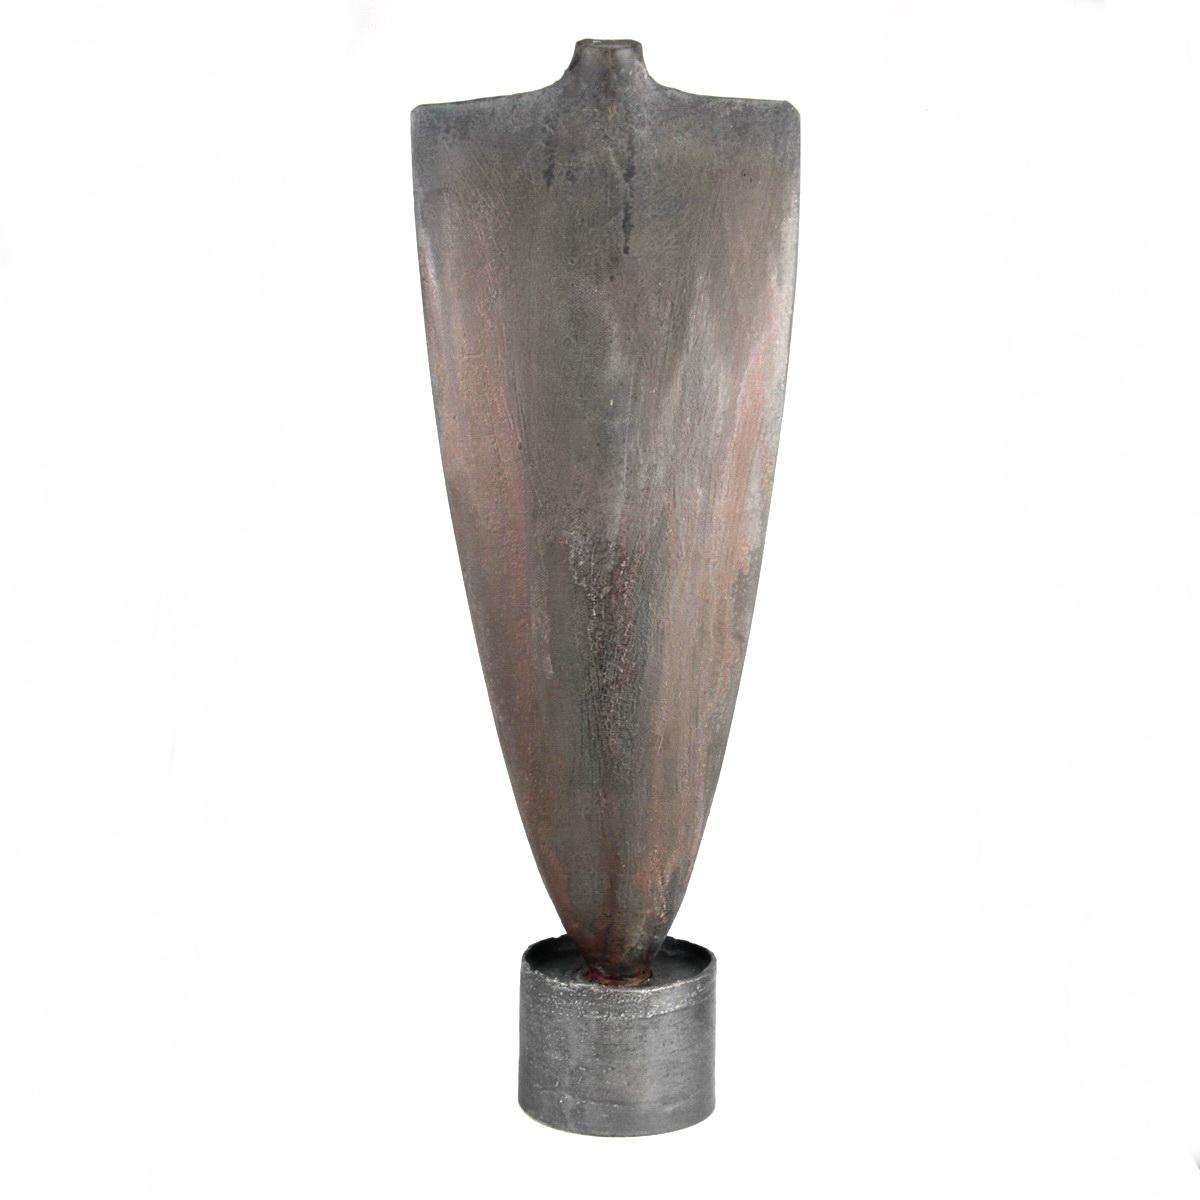 john-bedding-copper-glazed-pot-c29